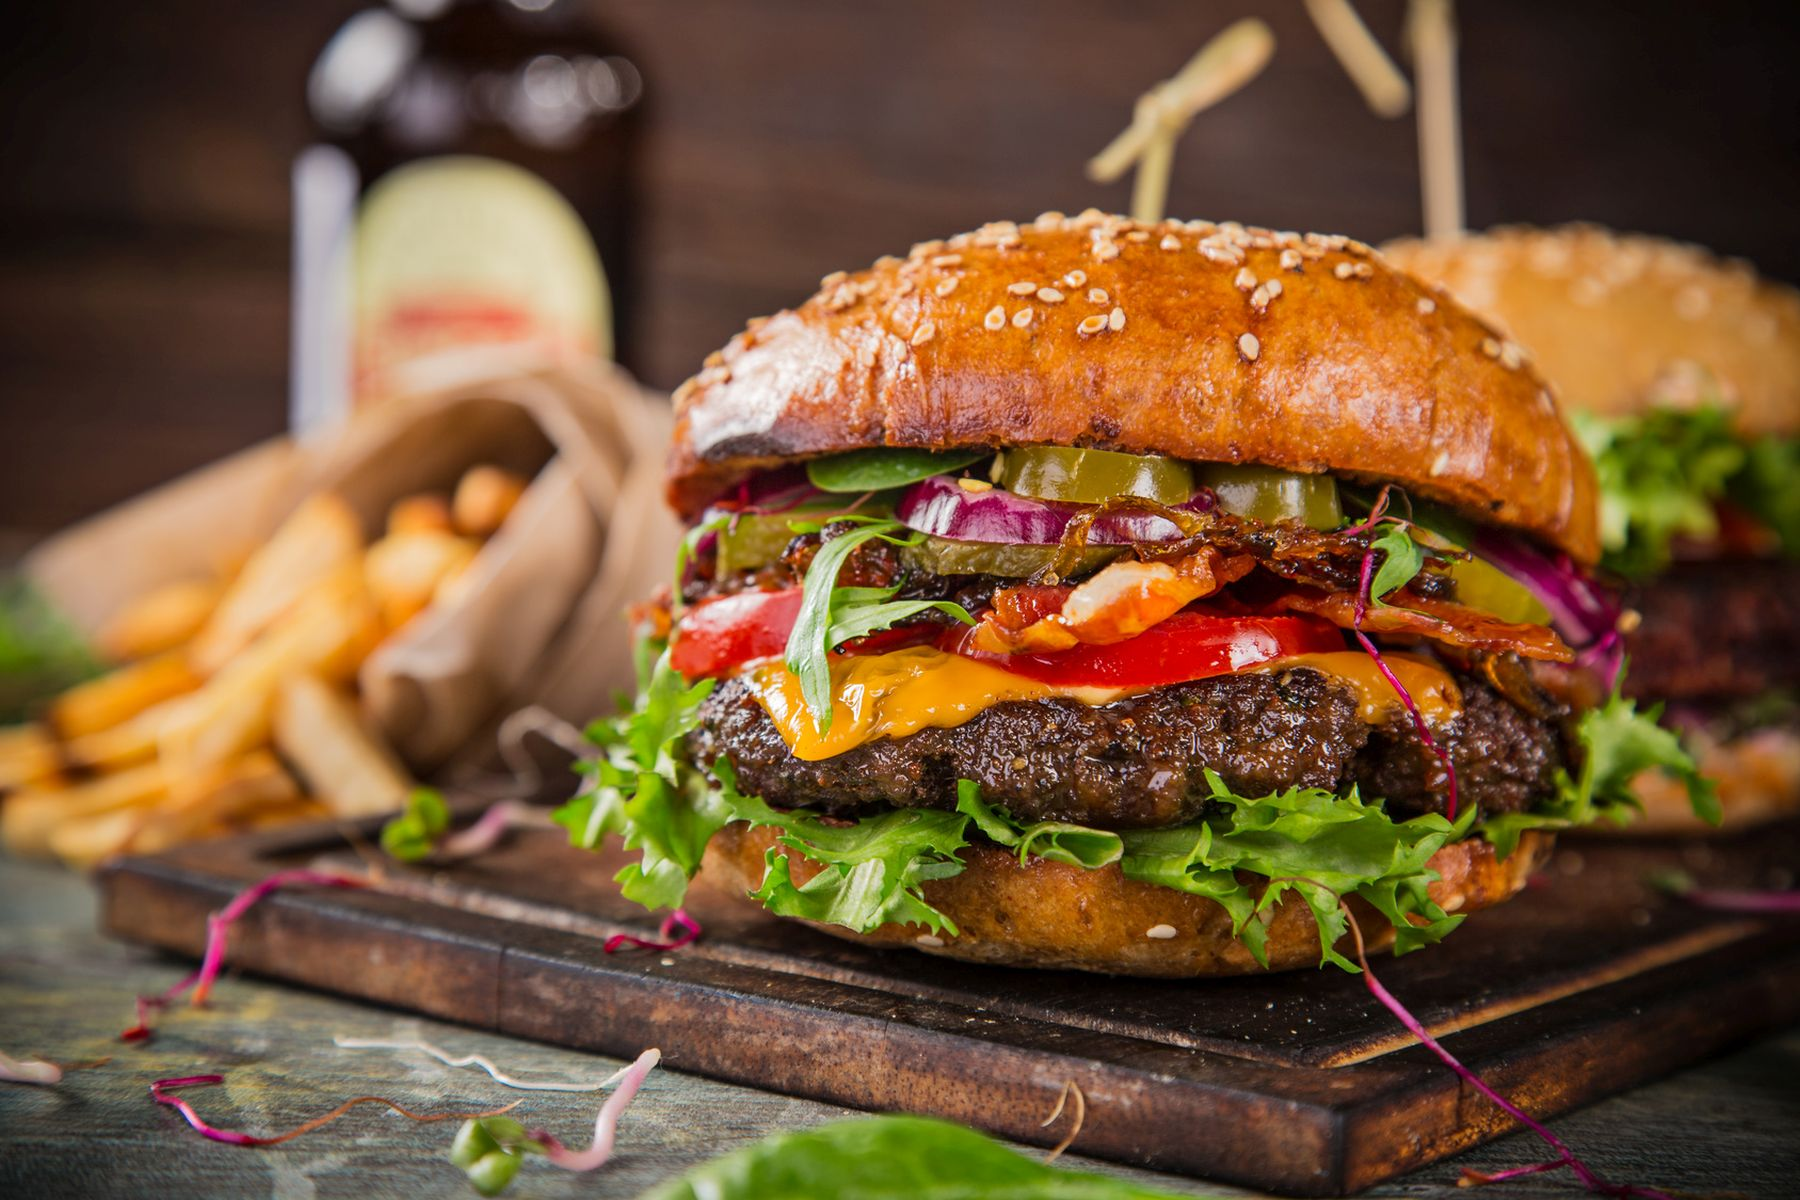 Restaurant HeimArt Steaks Burger Grill Barbeque Gastronomie Feier Catering Salzwedel